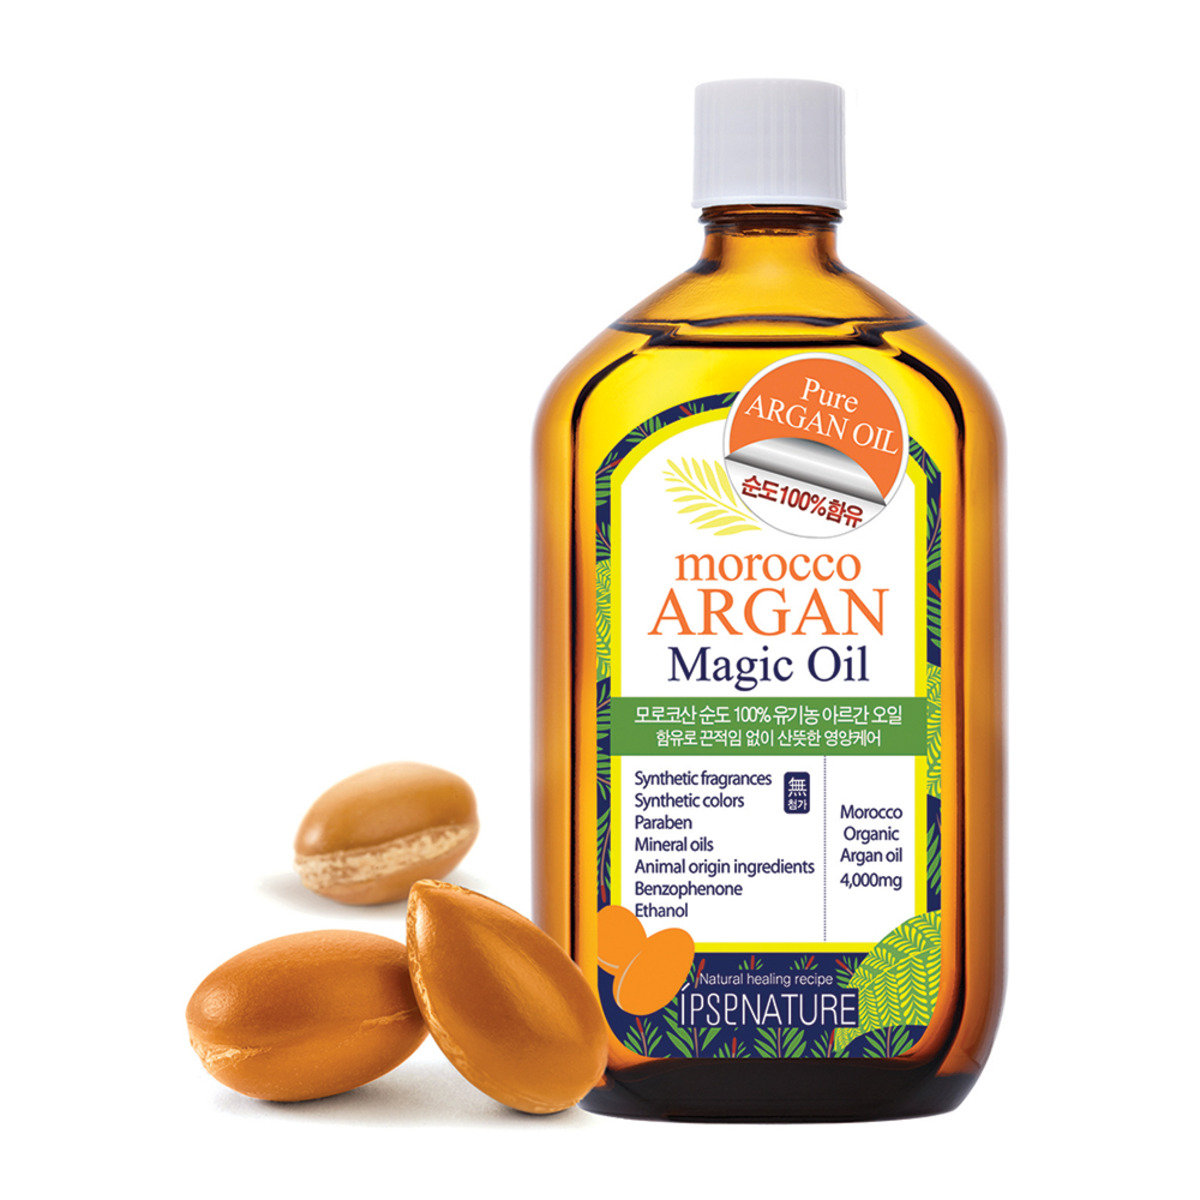 argan oil origin